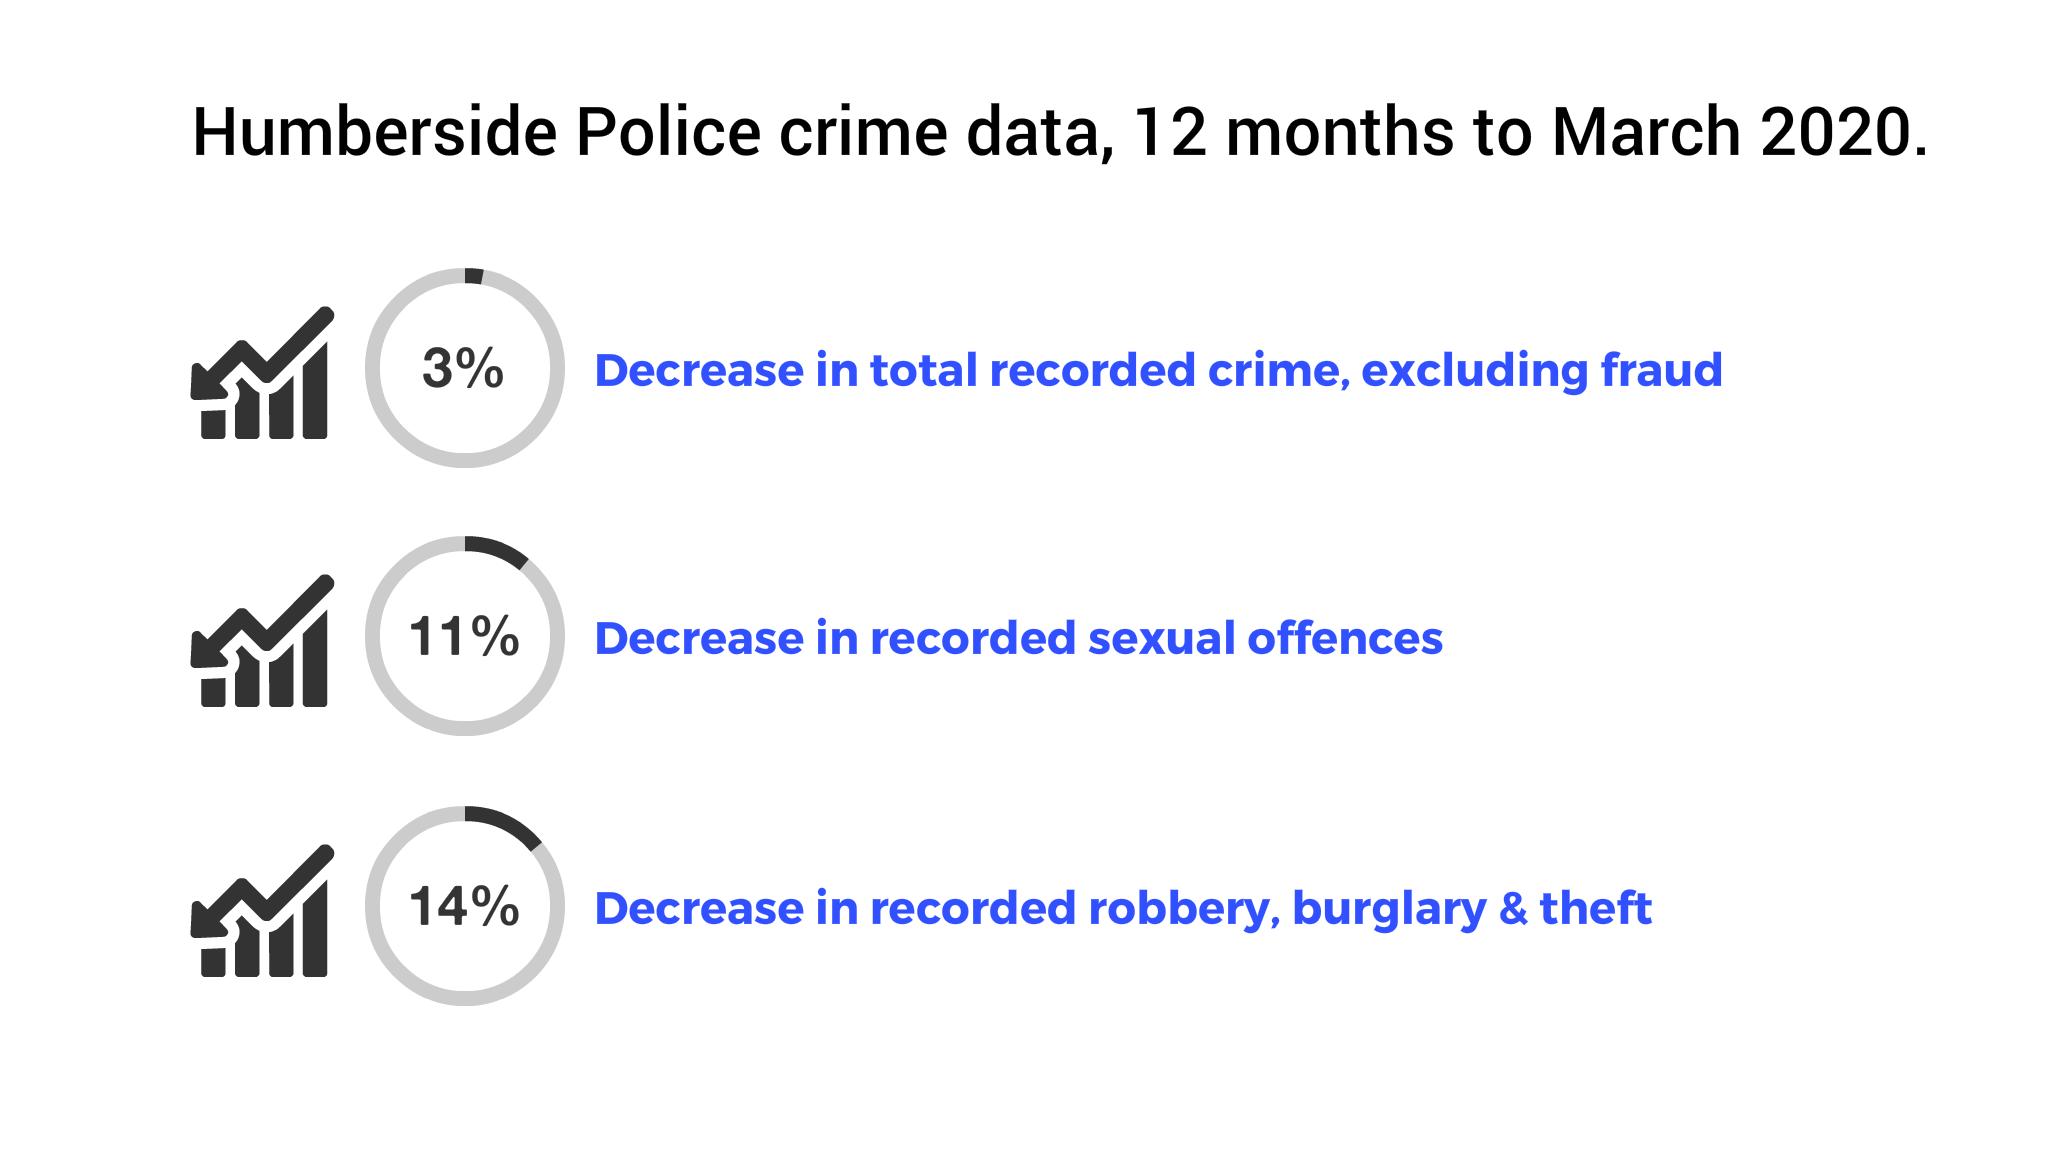 Humberside Police crime data